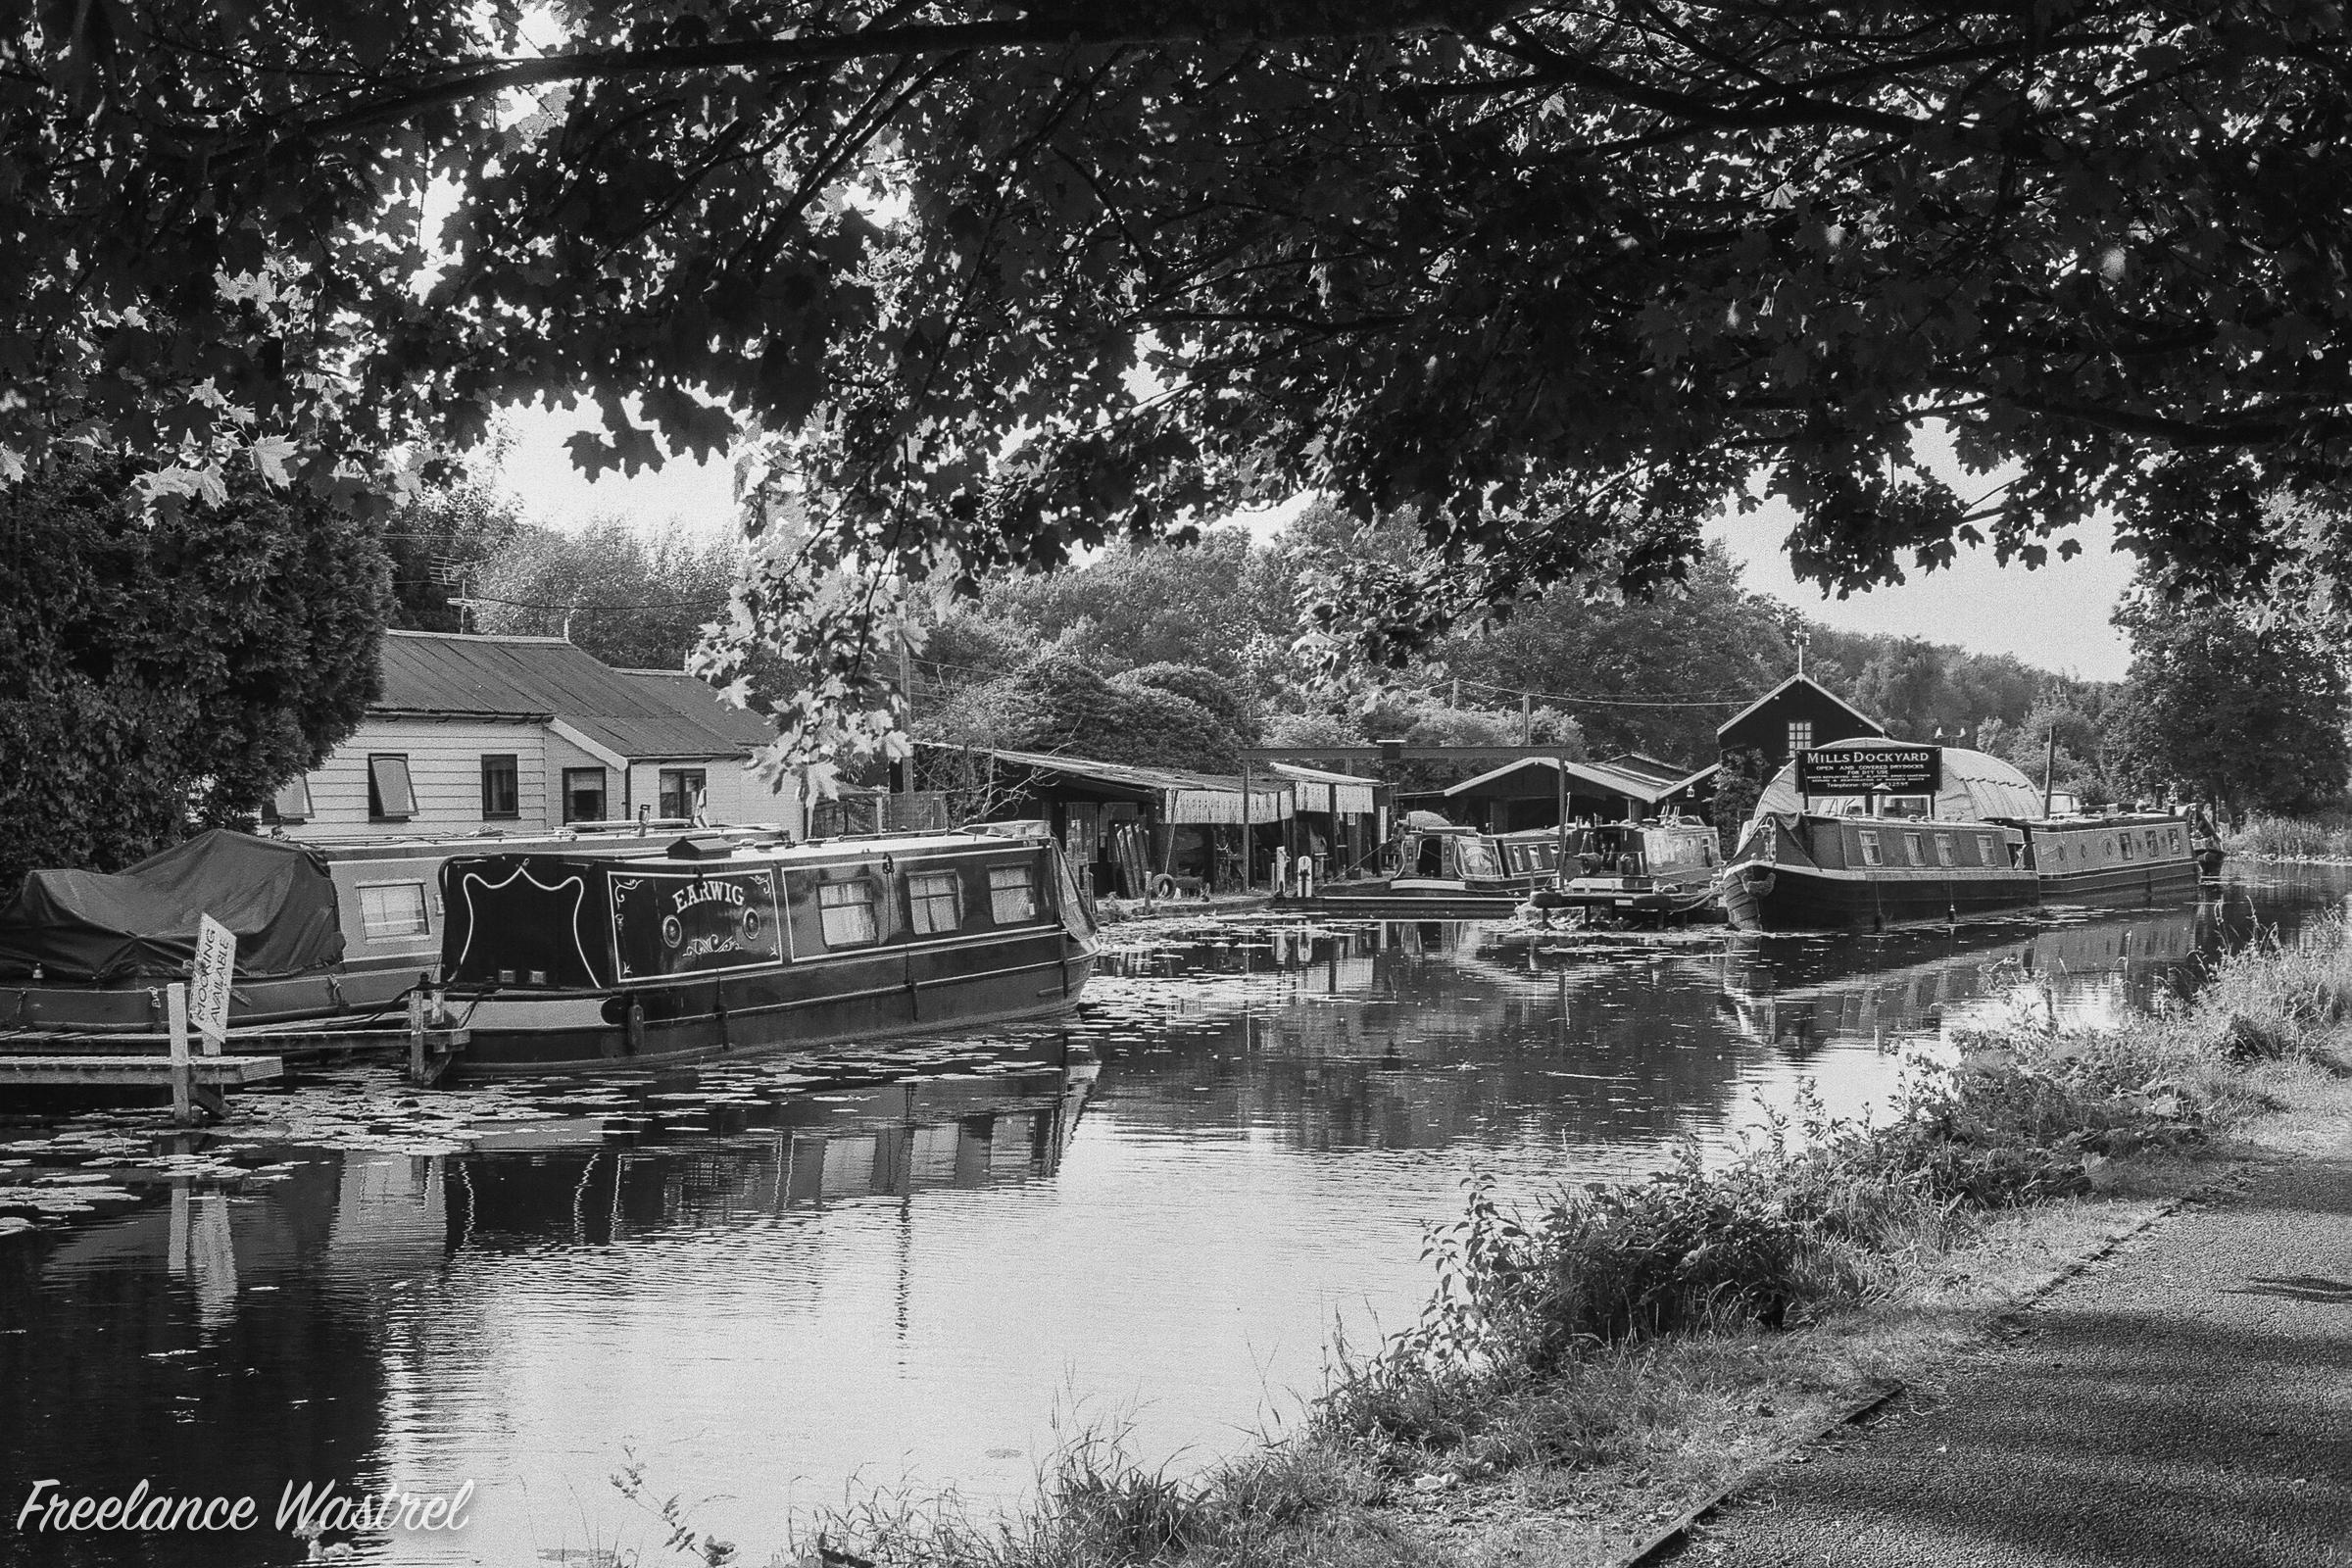 Erewash Canal, July 2018